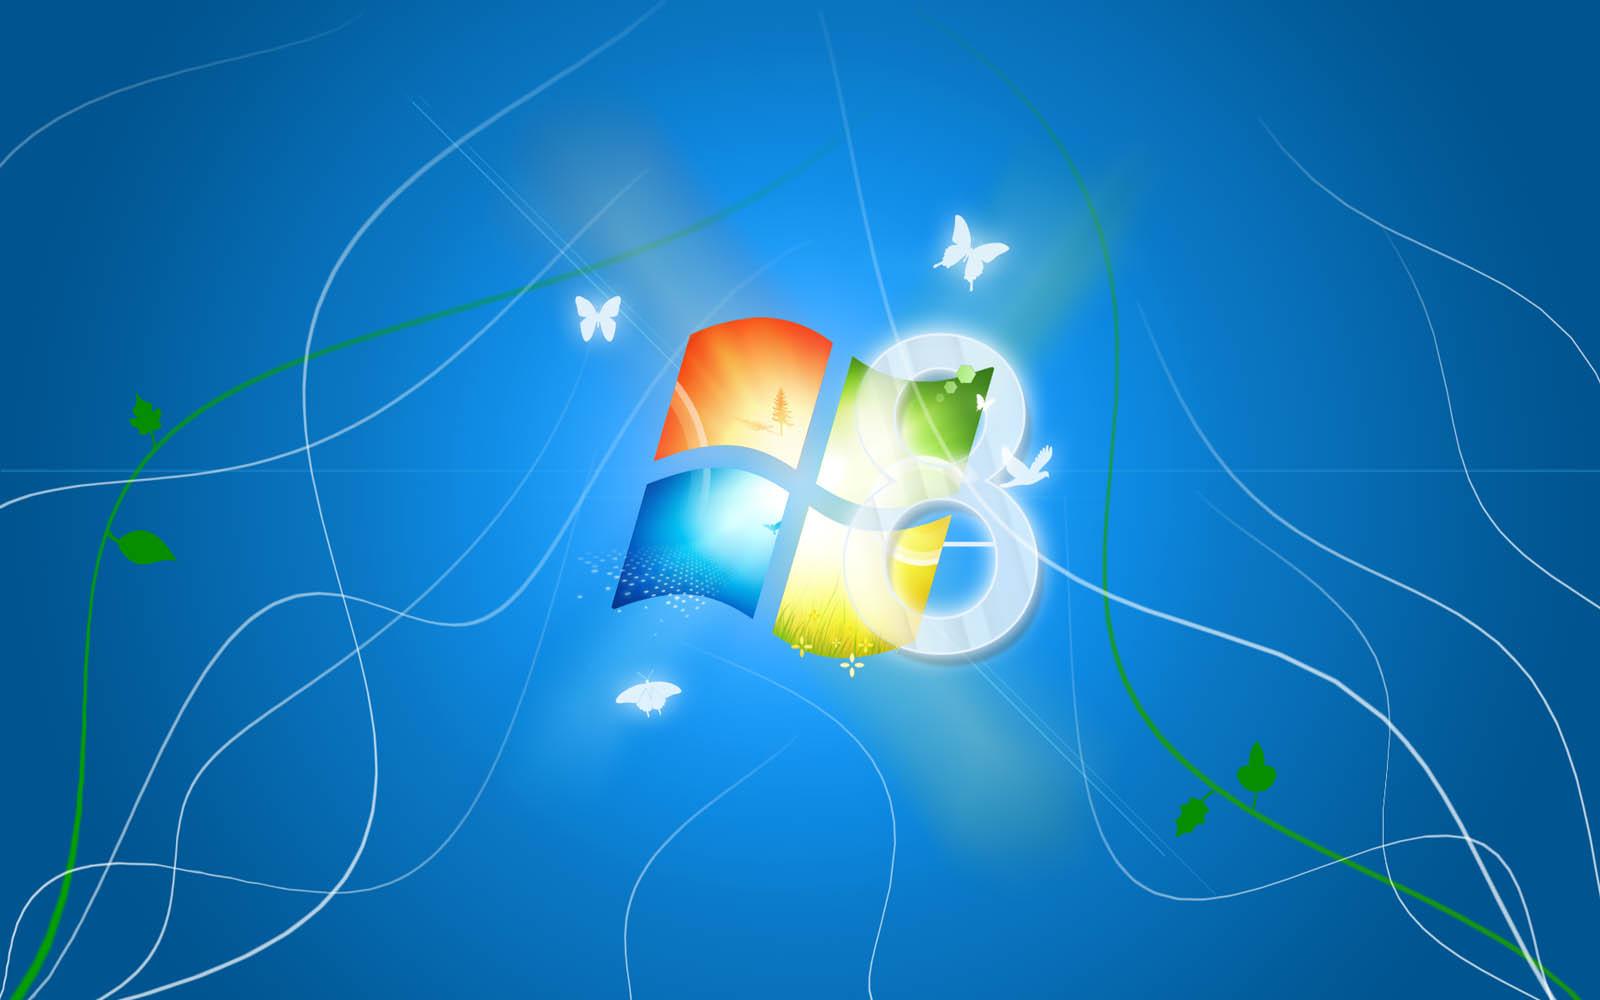 wallpapers Windows 8 Desktop Wallpapers and Backgrounds 1600x1000